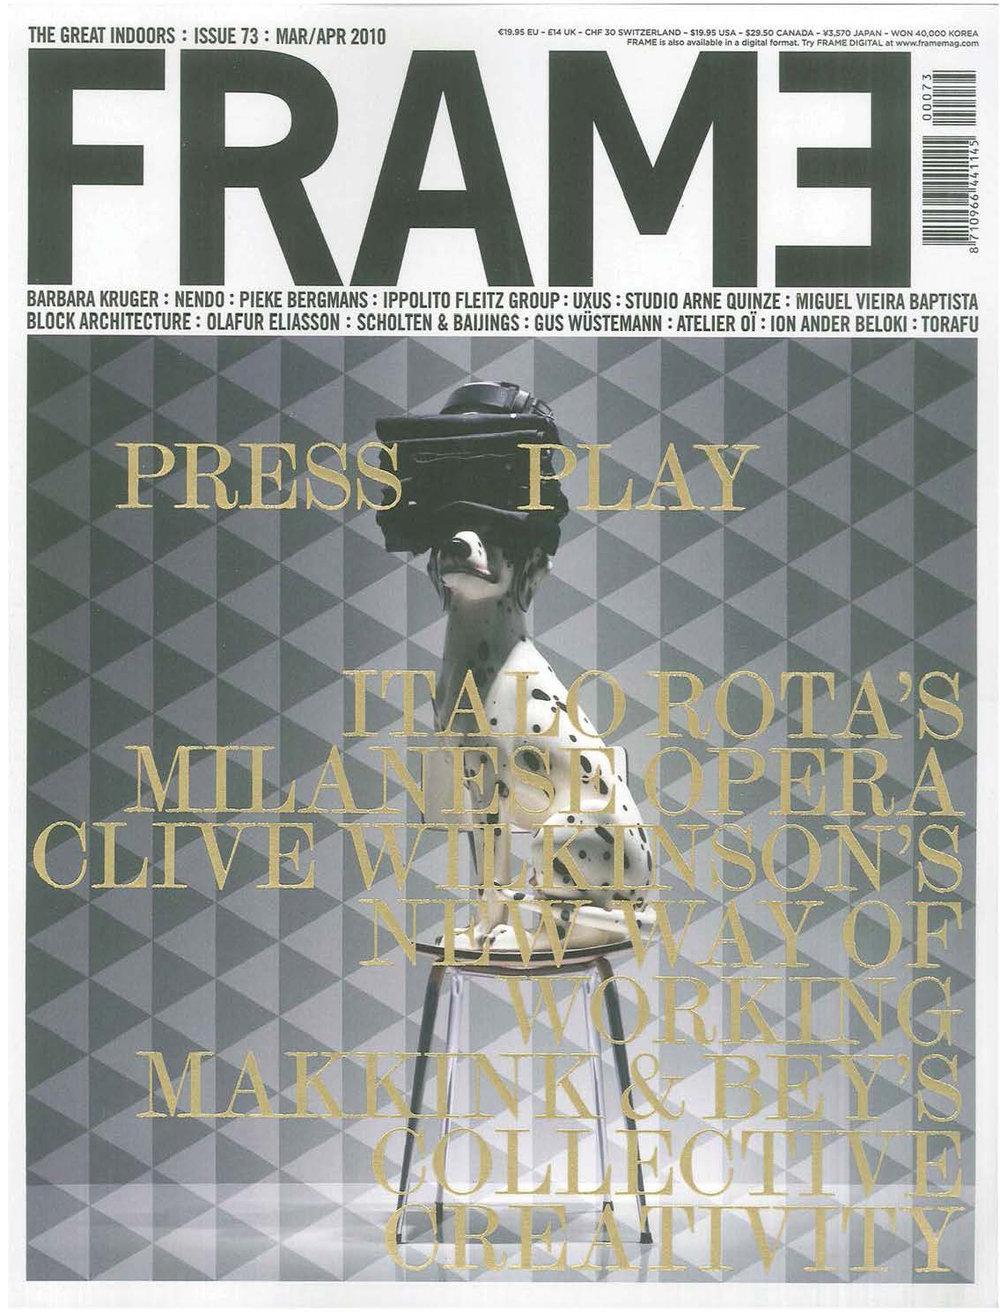 2010Mar-Apr-FRAME-DomaineLA 2 - Copy.jpg